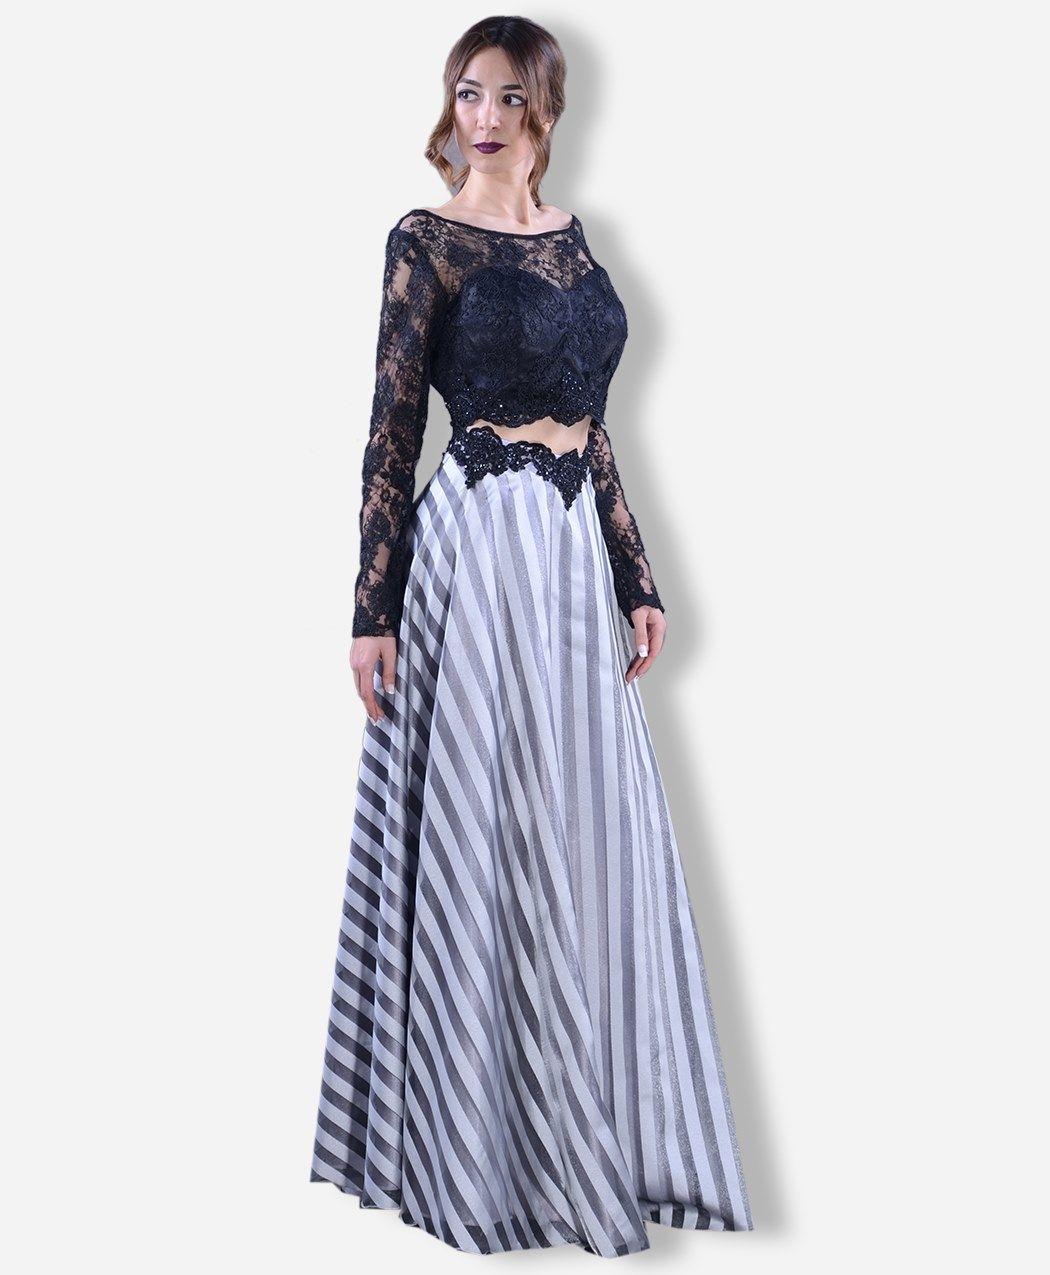 Ust Parcasi Dantel Ikili Abiye St5248 Elbise Elbise Modelleri Dantel